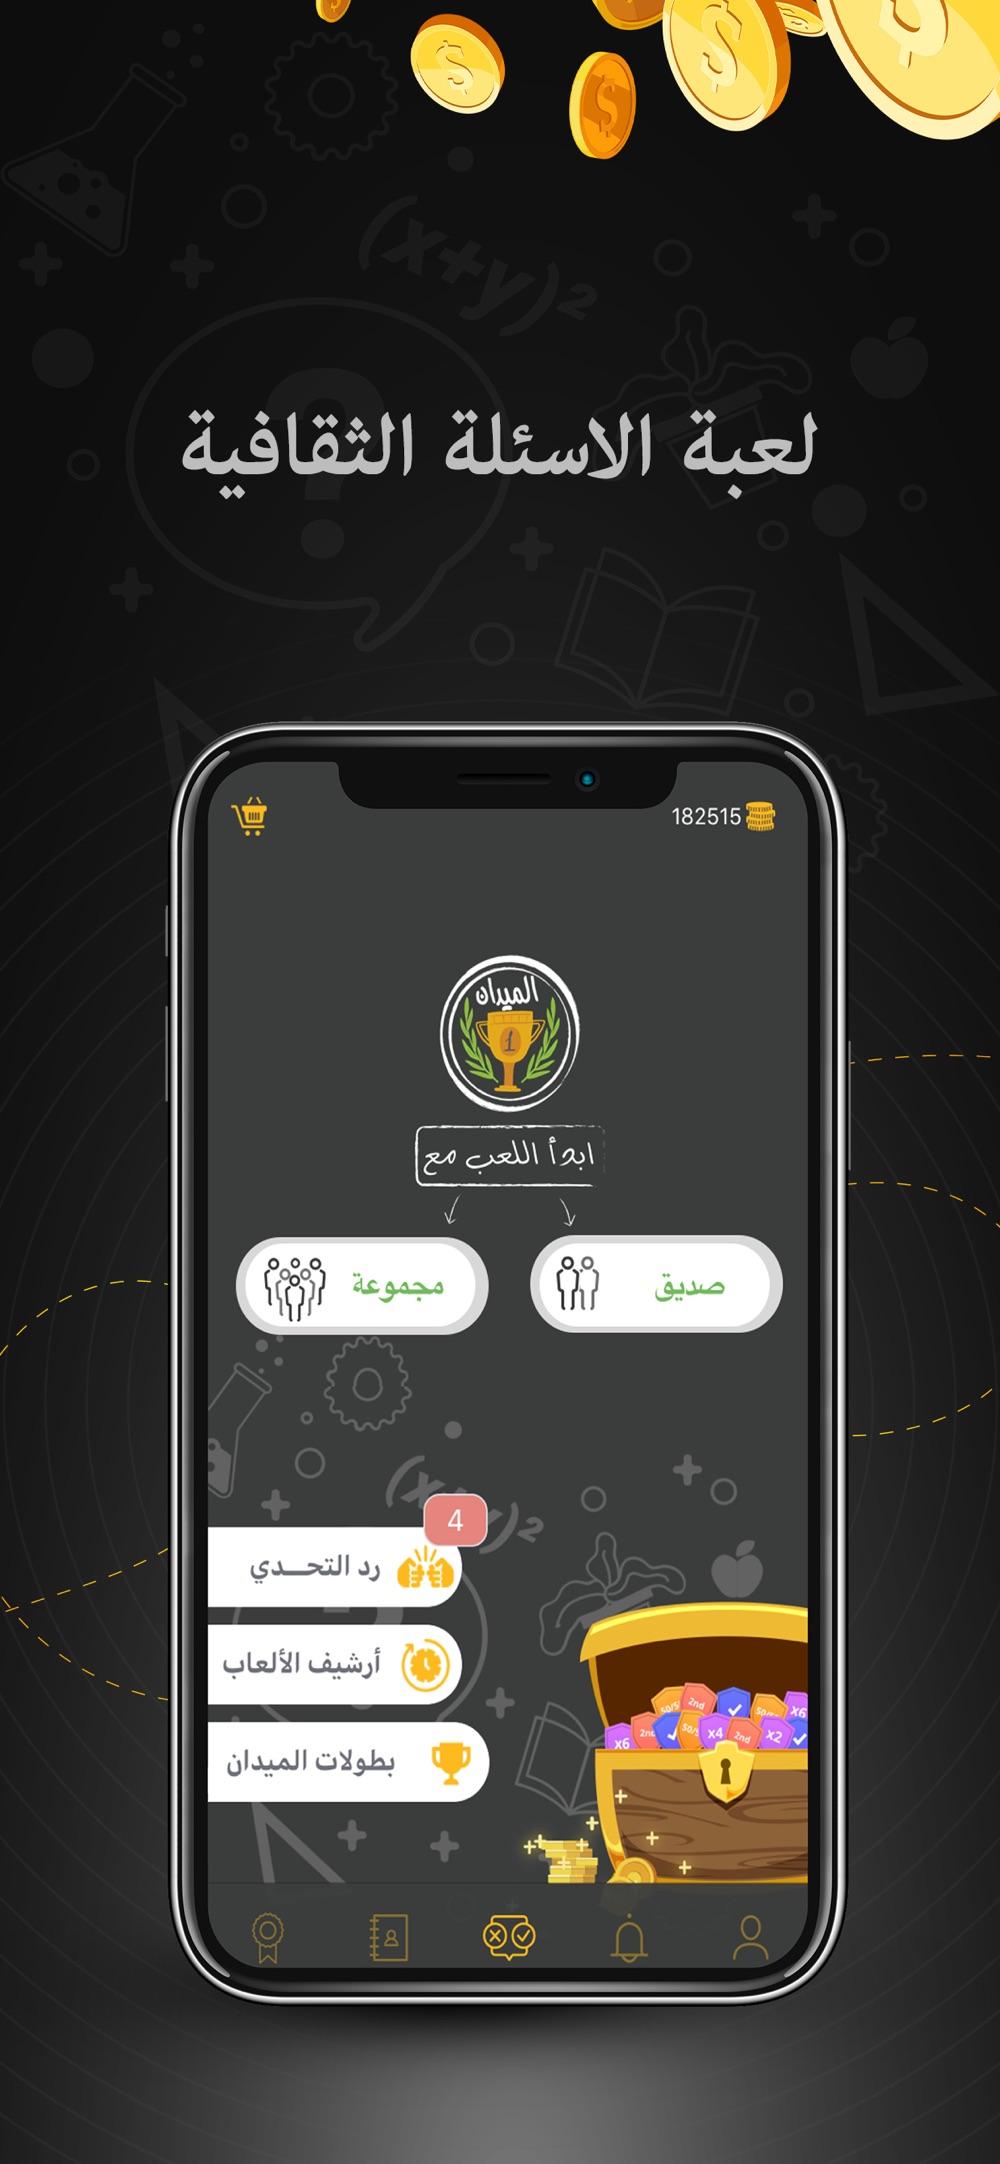 Almedan-الميدان hack tool